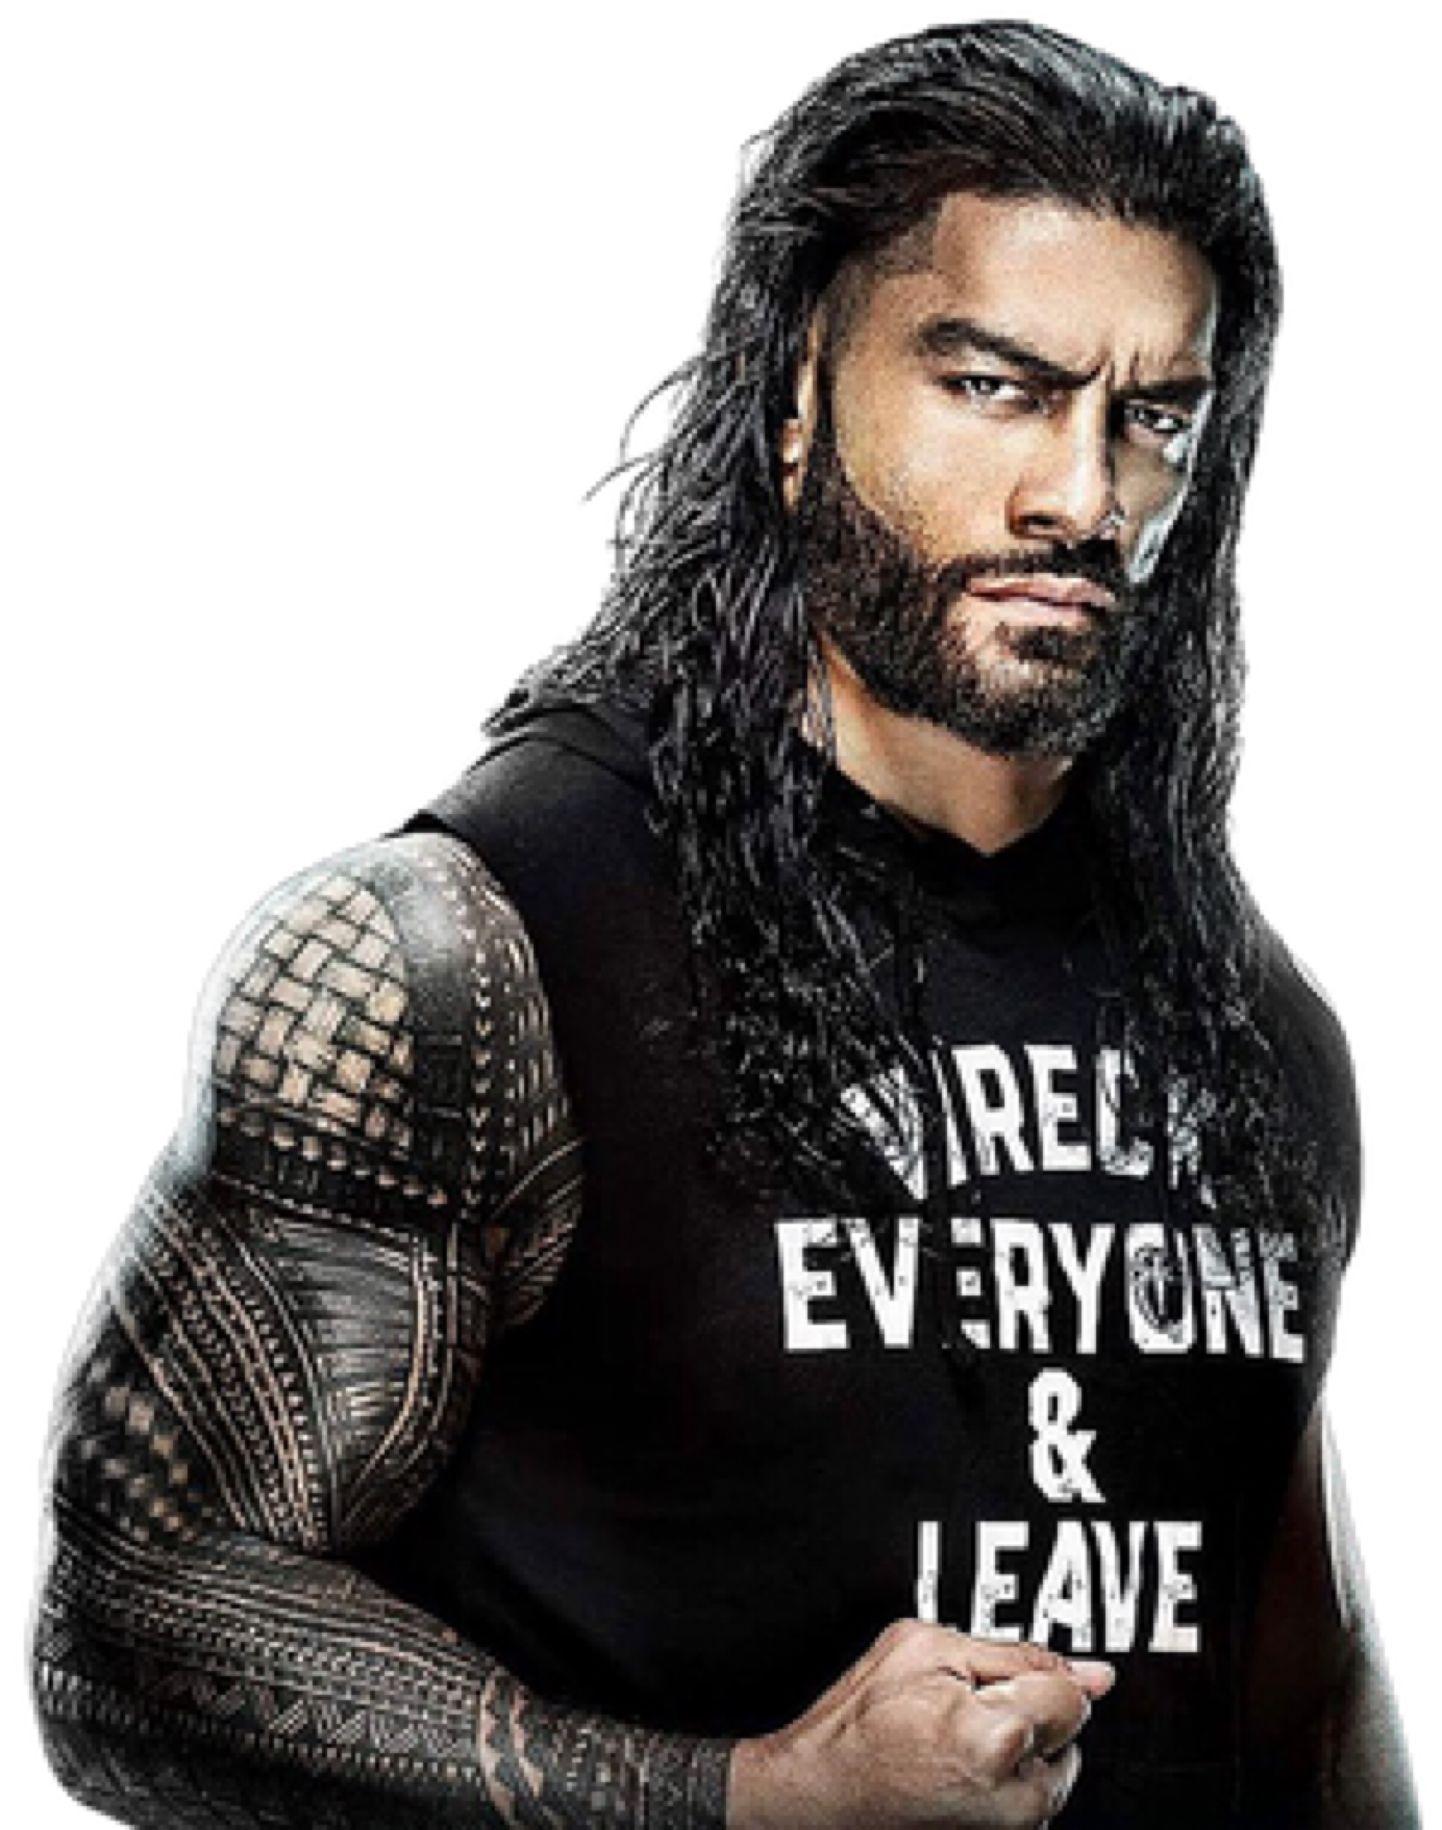 Roman Reigns Tlc 2020 Png By Ambriegnsasylum16 On Deviantart In 2021 Roman Reigns Wwe Superstar Roman Reigns Roman